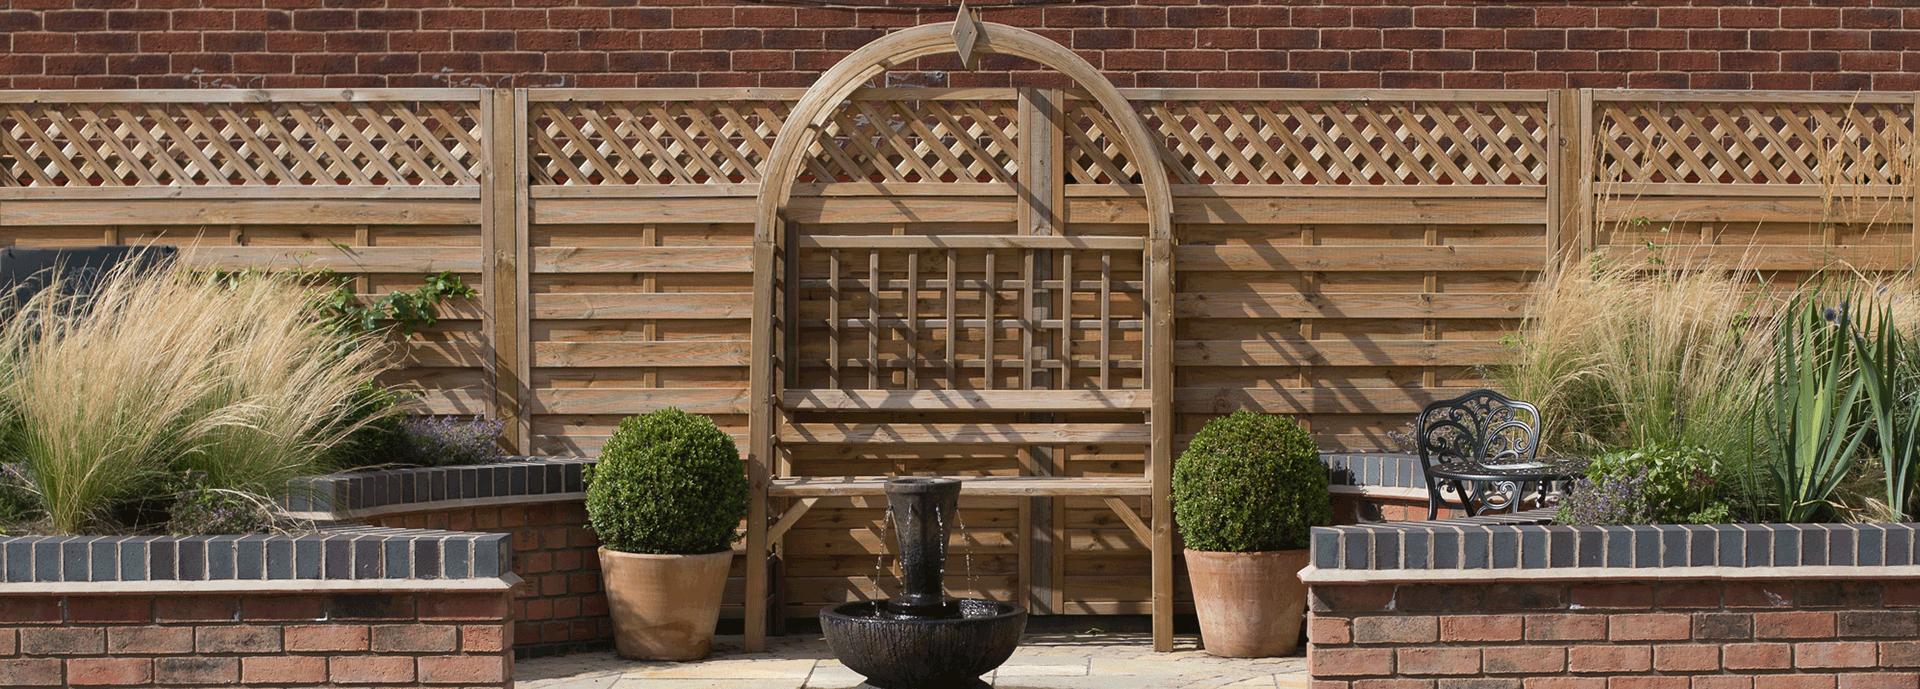 DM Garden Design